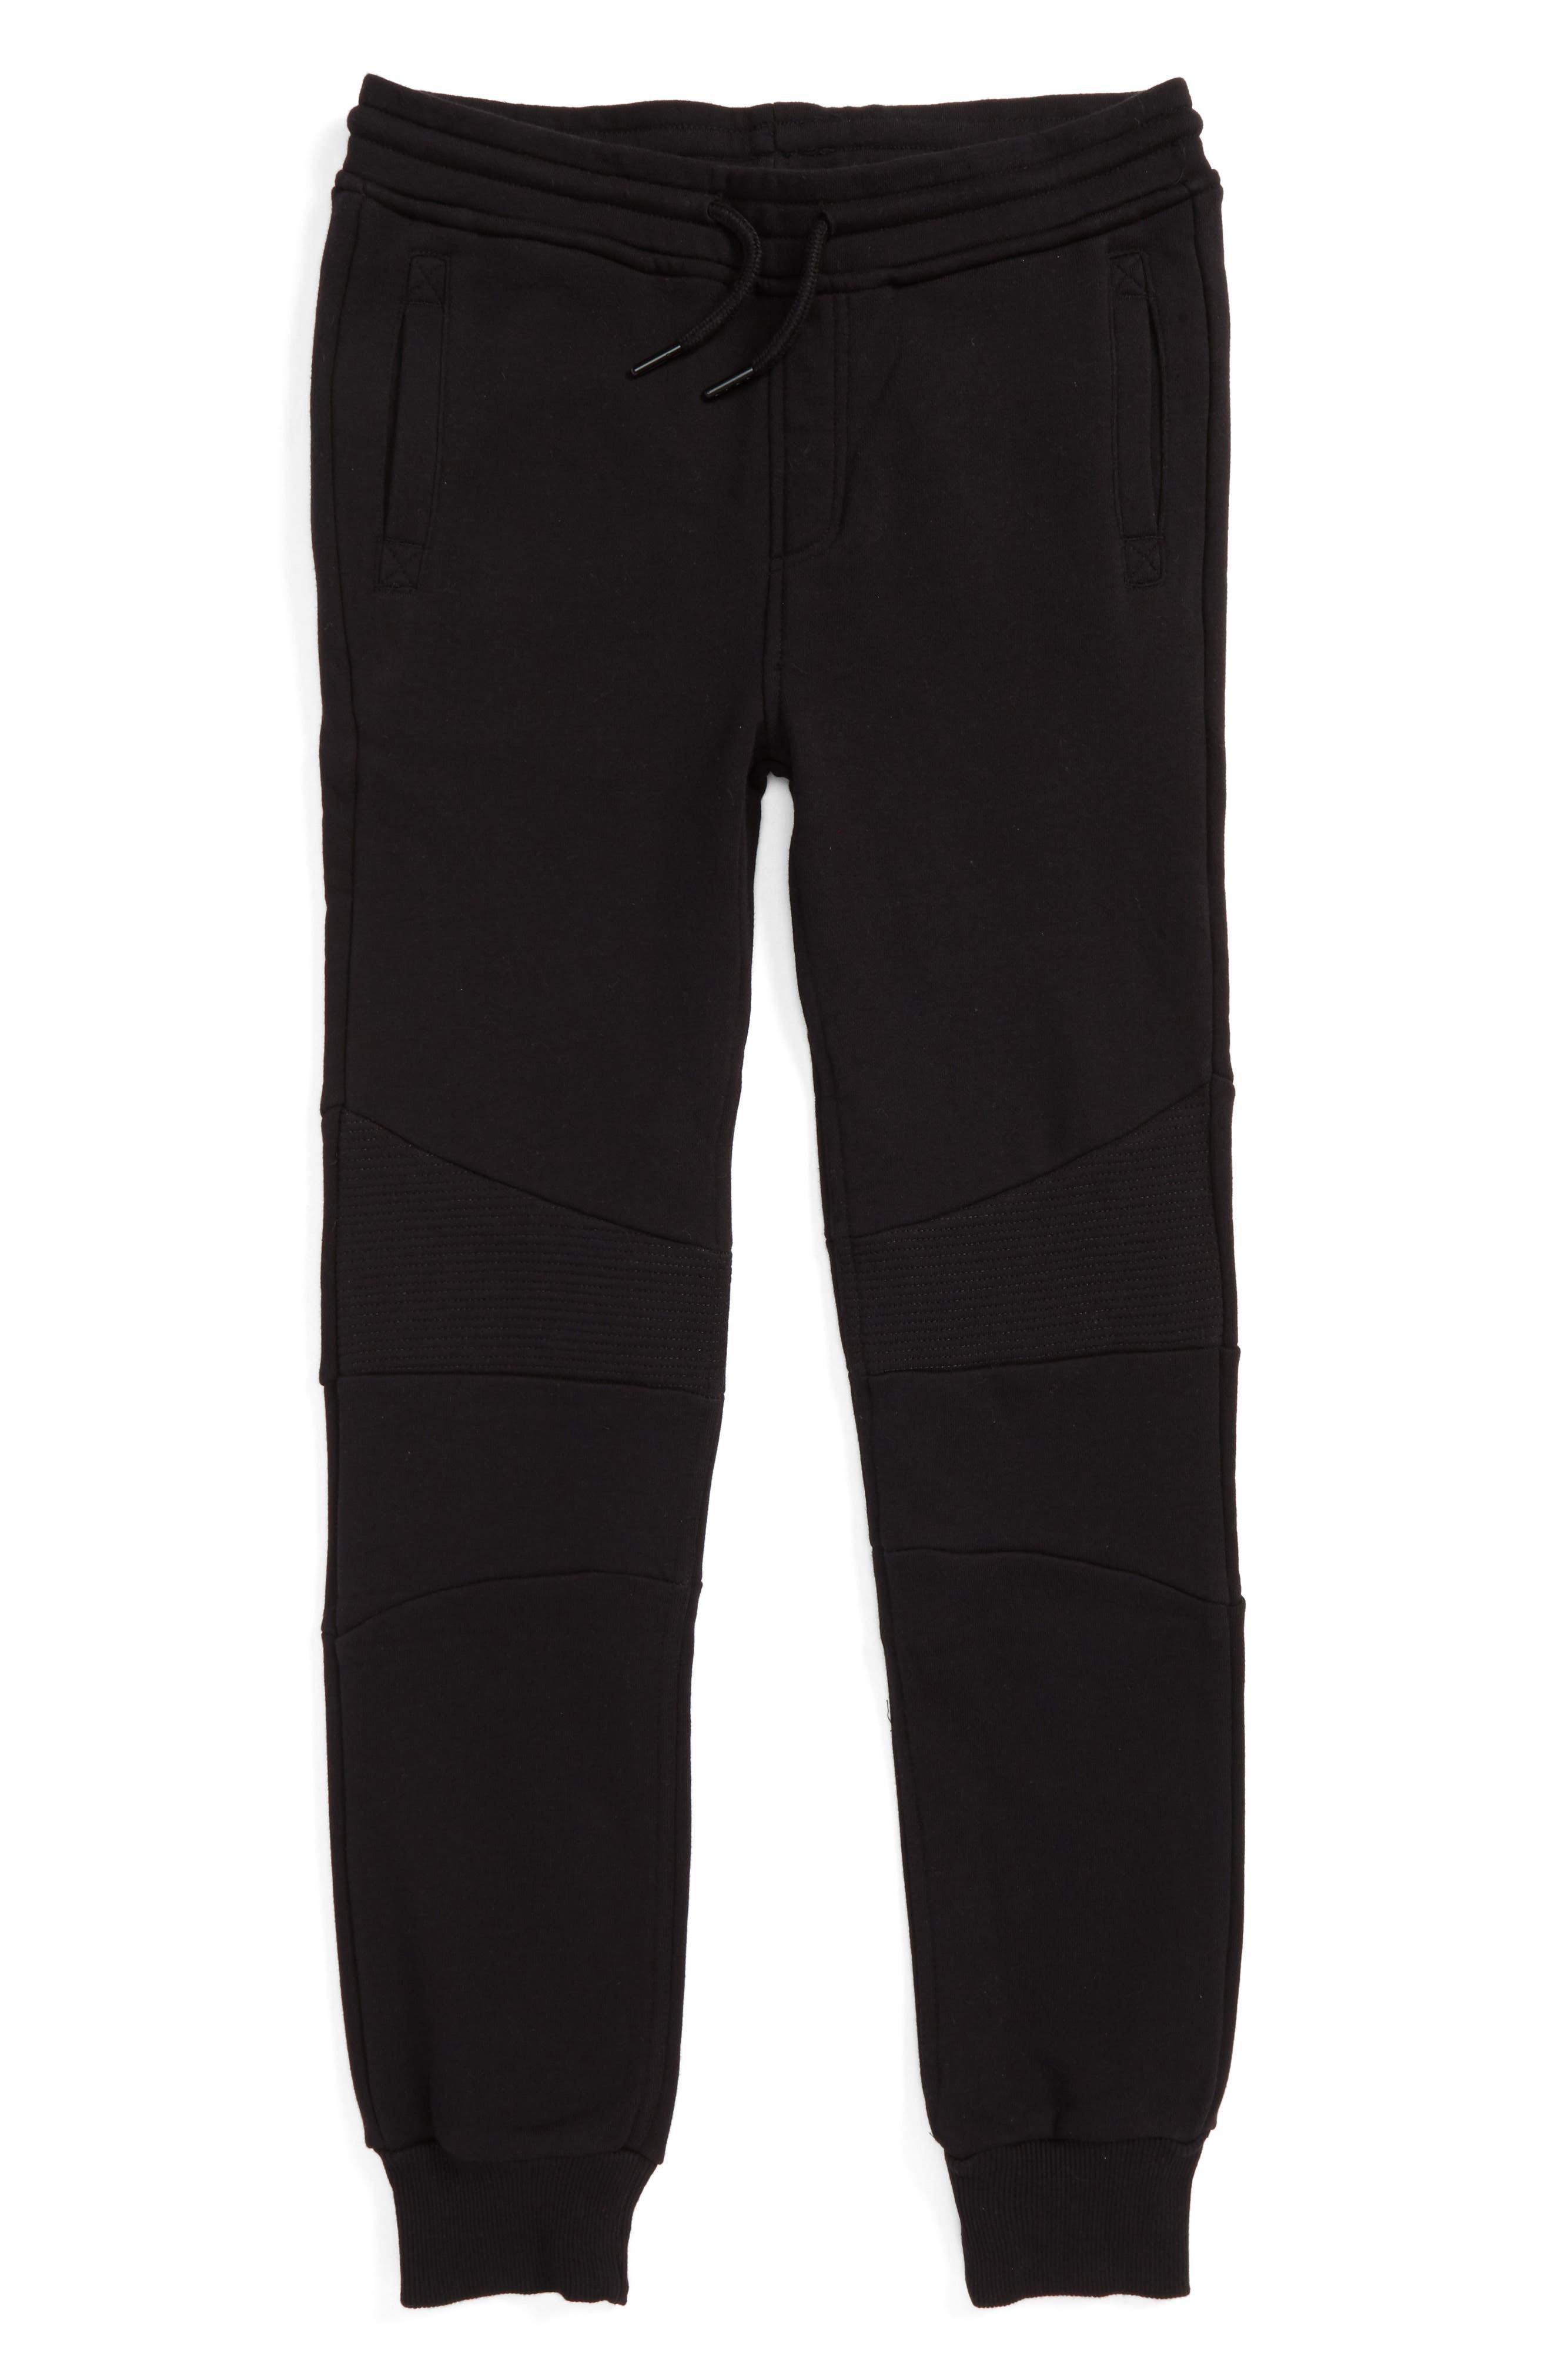 Main Image - Superism Julius Knit Jogger Pants (Big Boys)